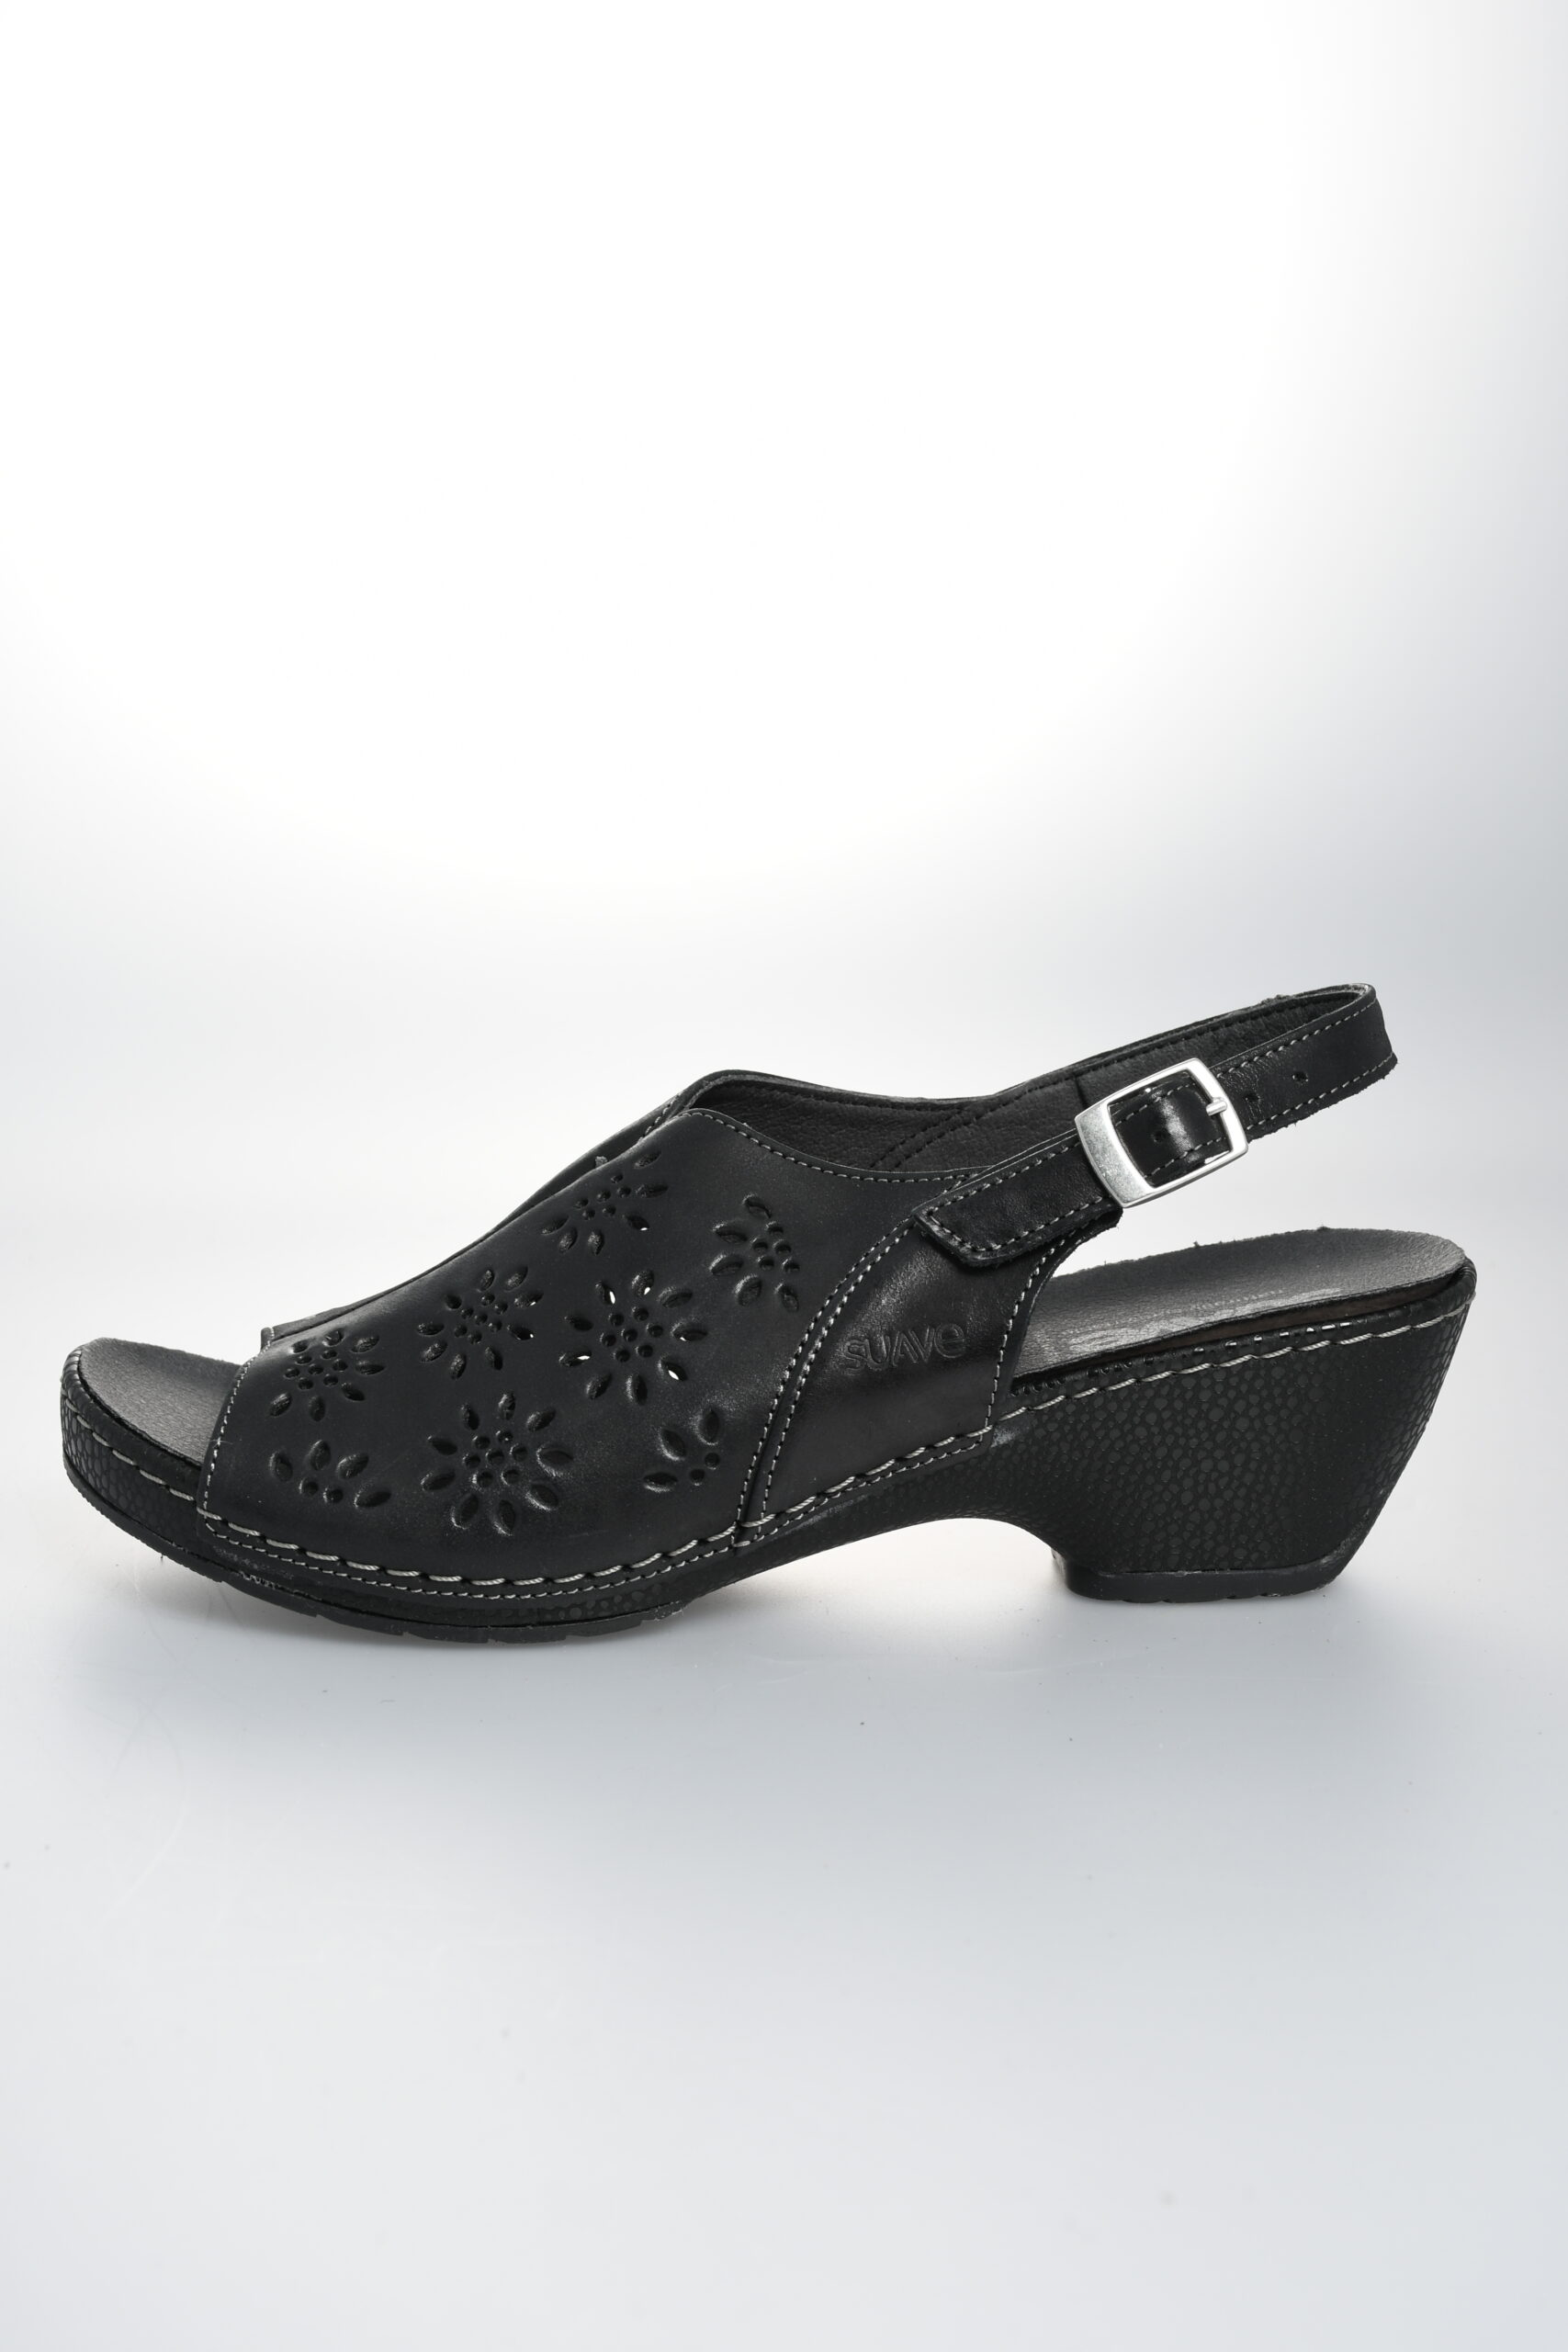 Sandal Suave